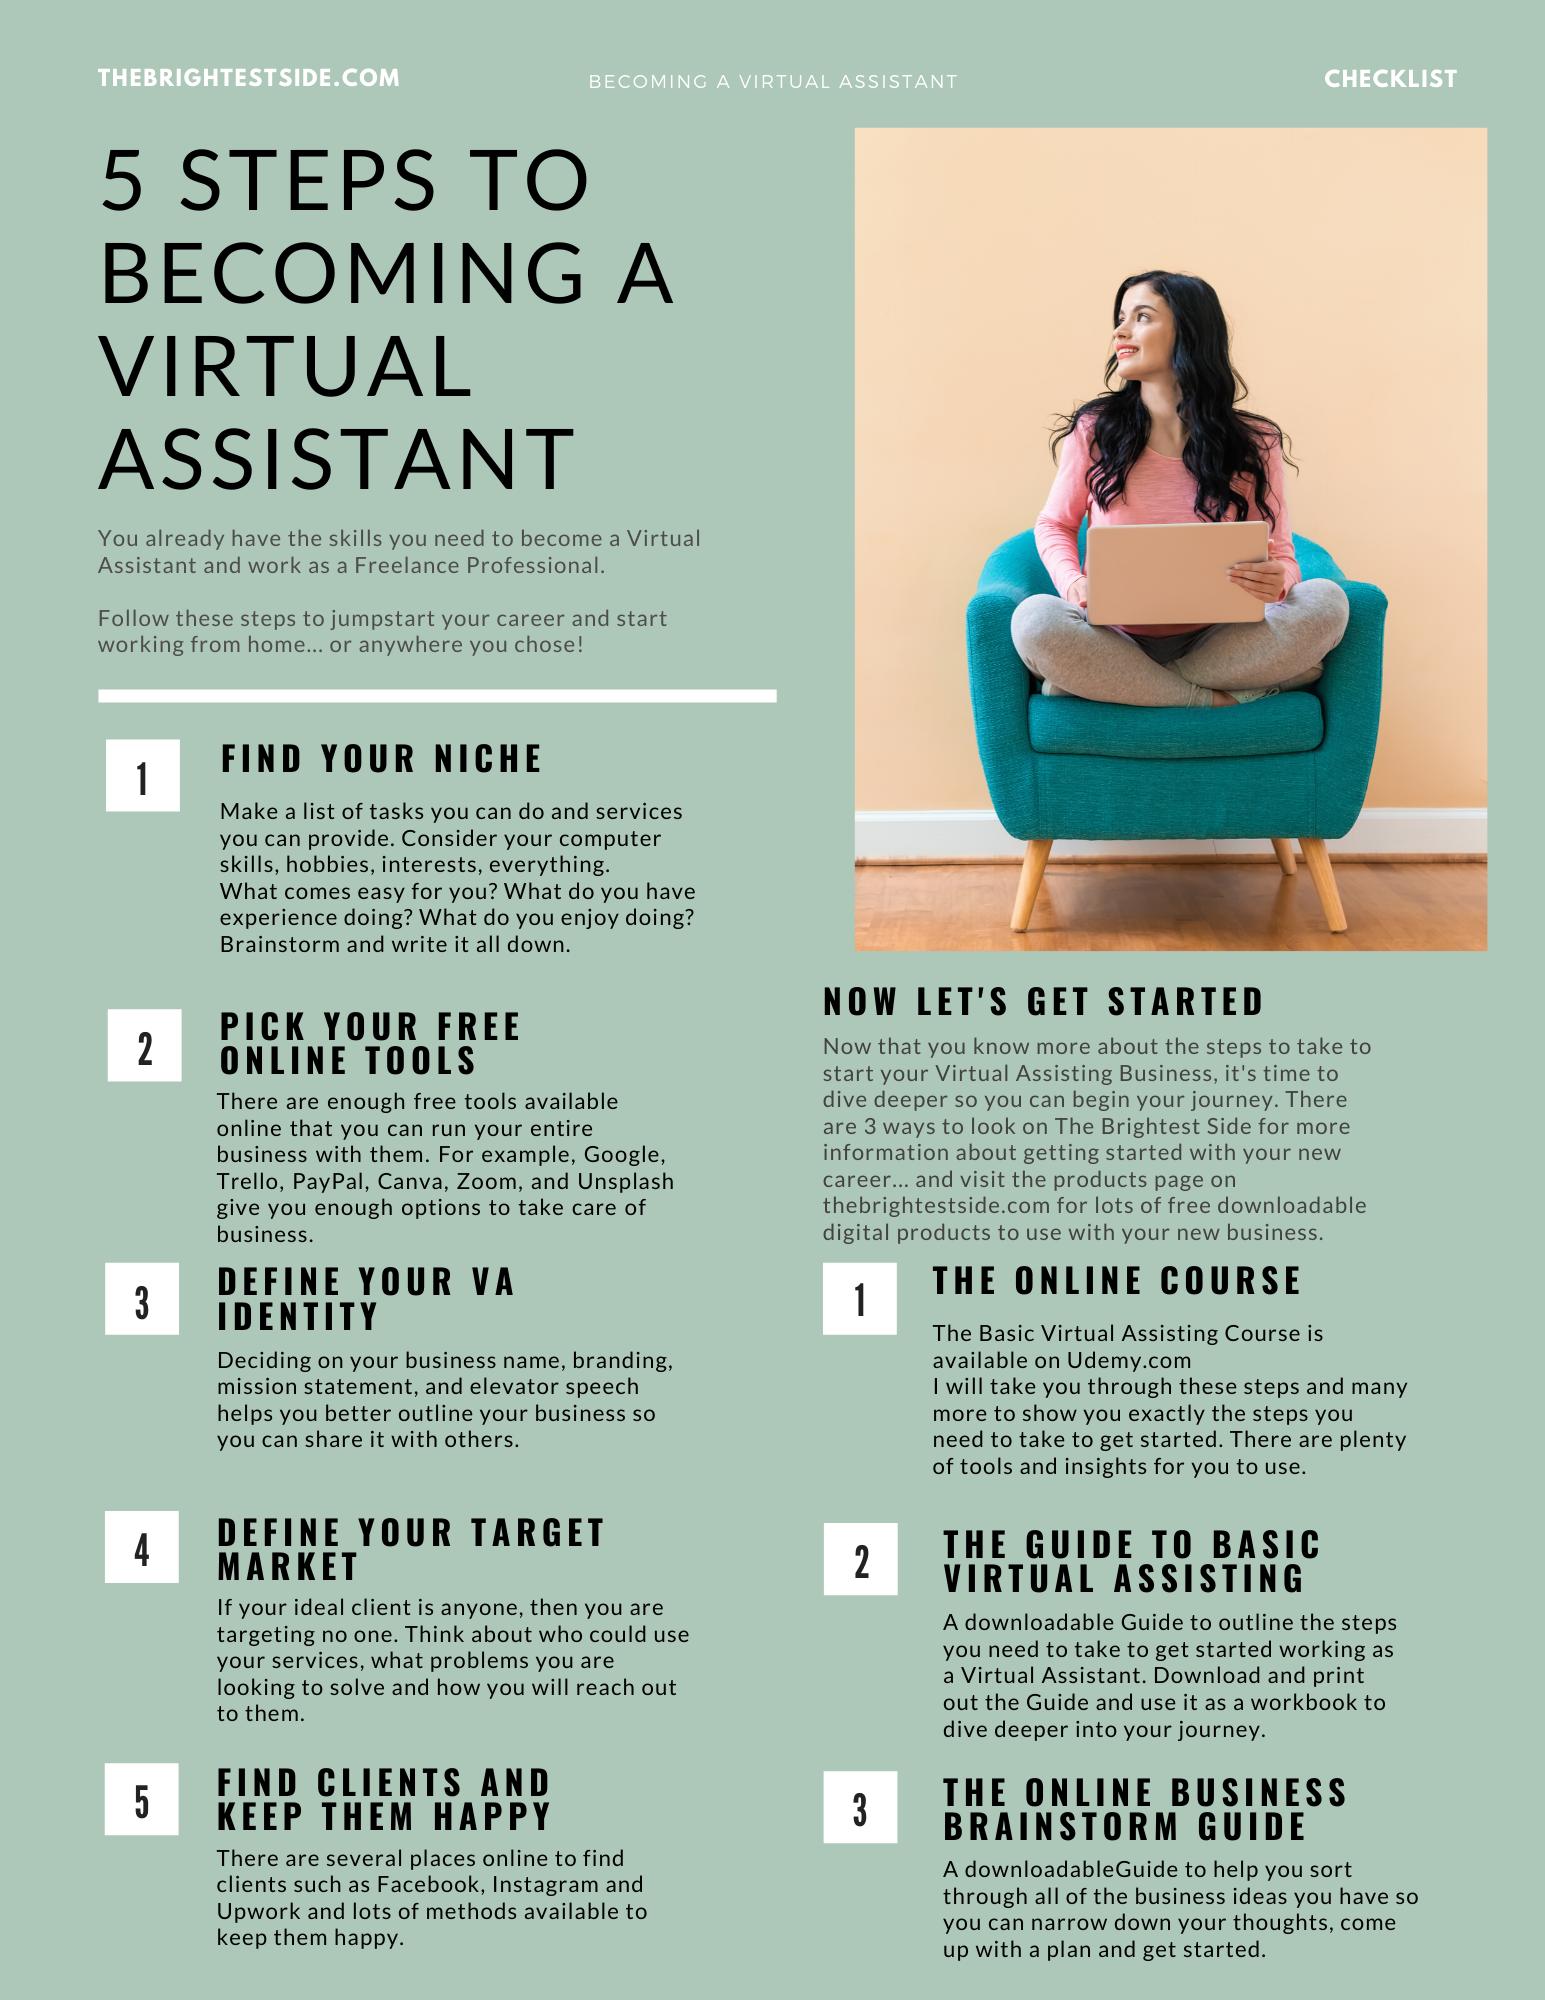 5 steps checklist.png